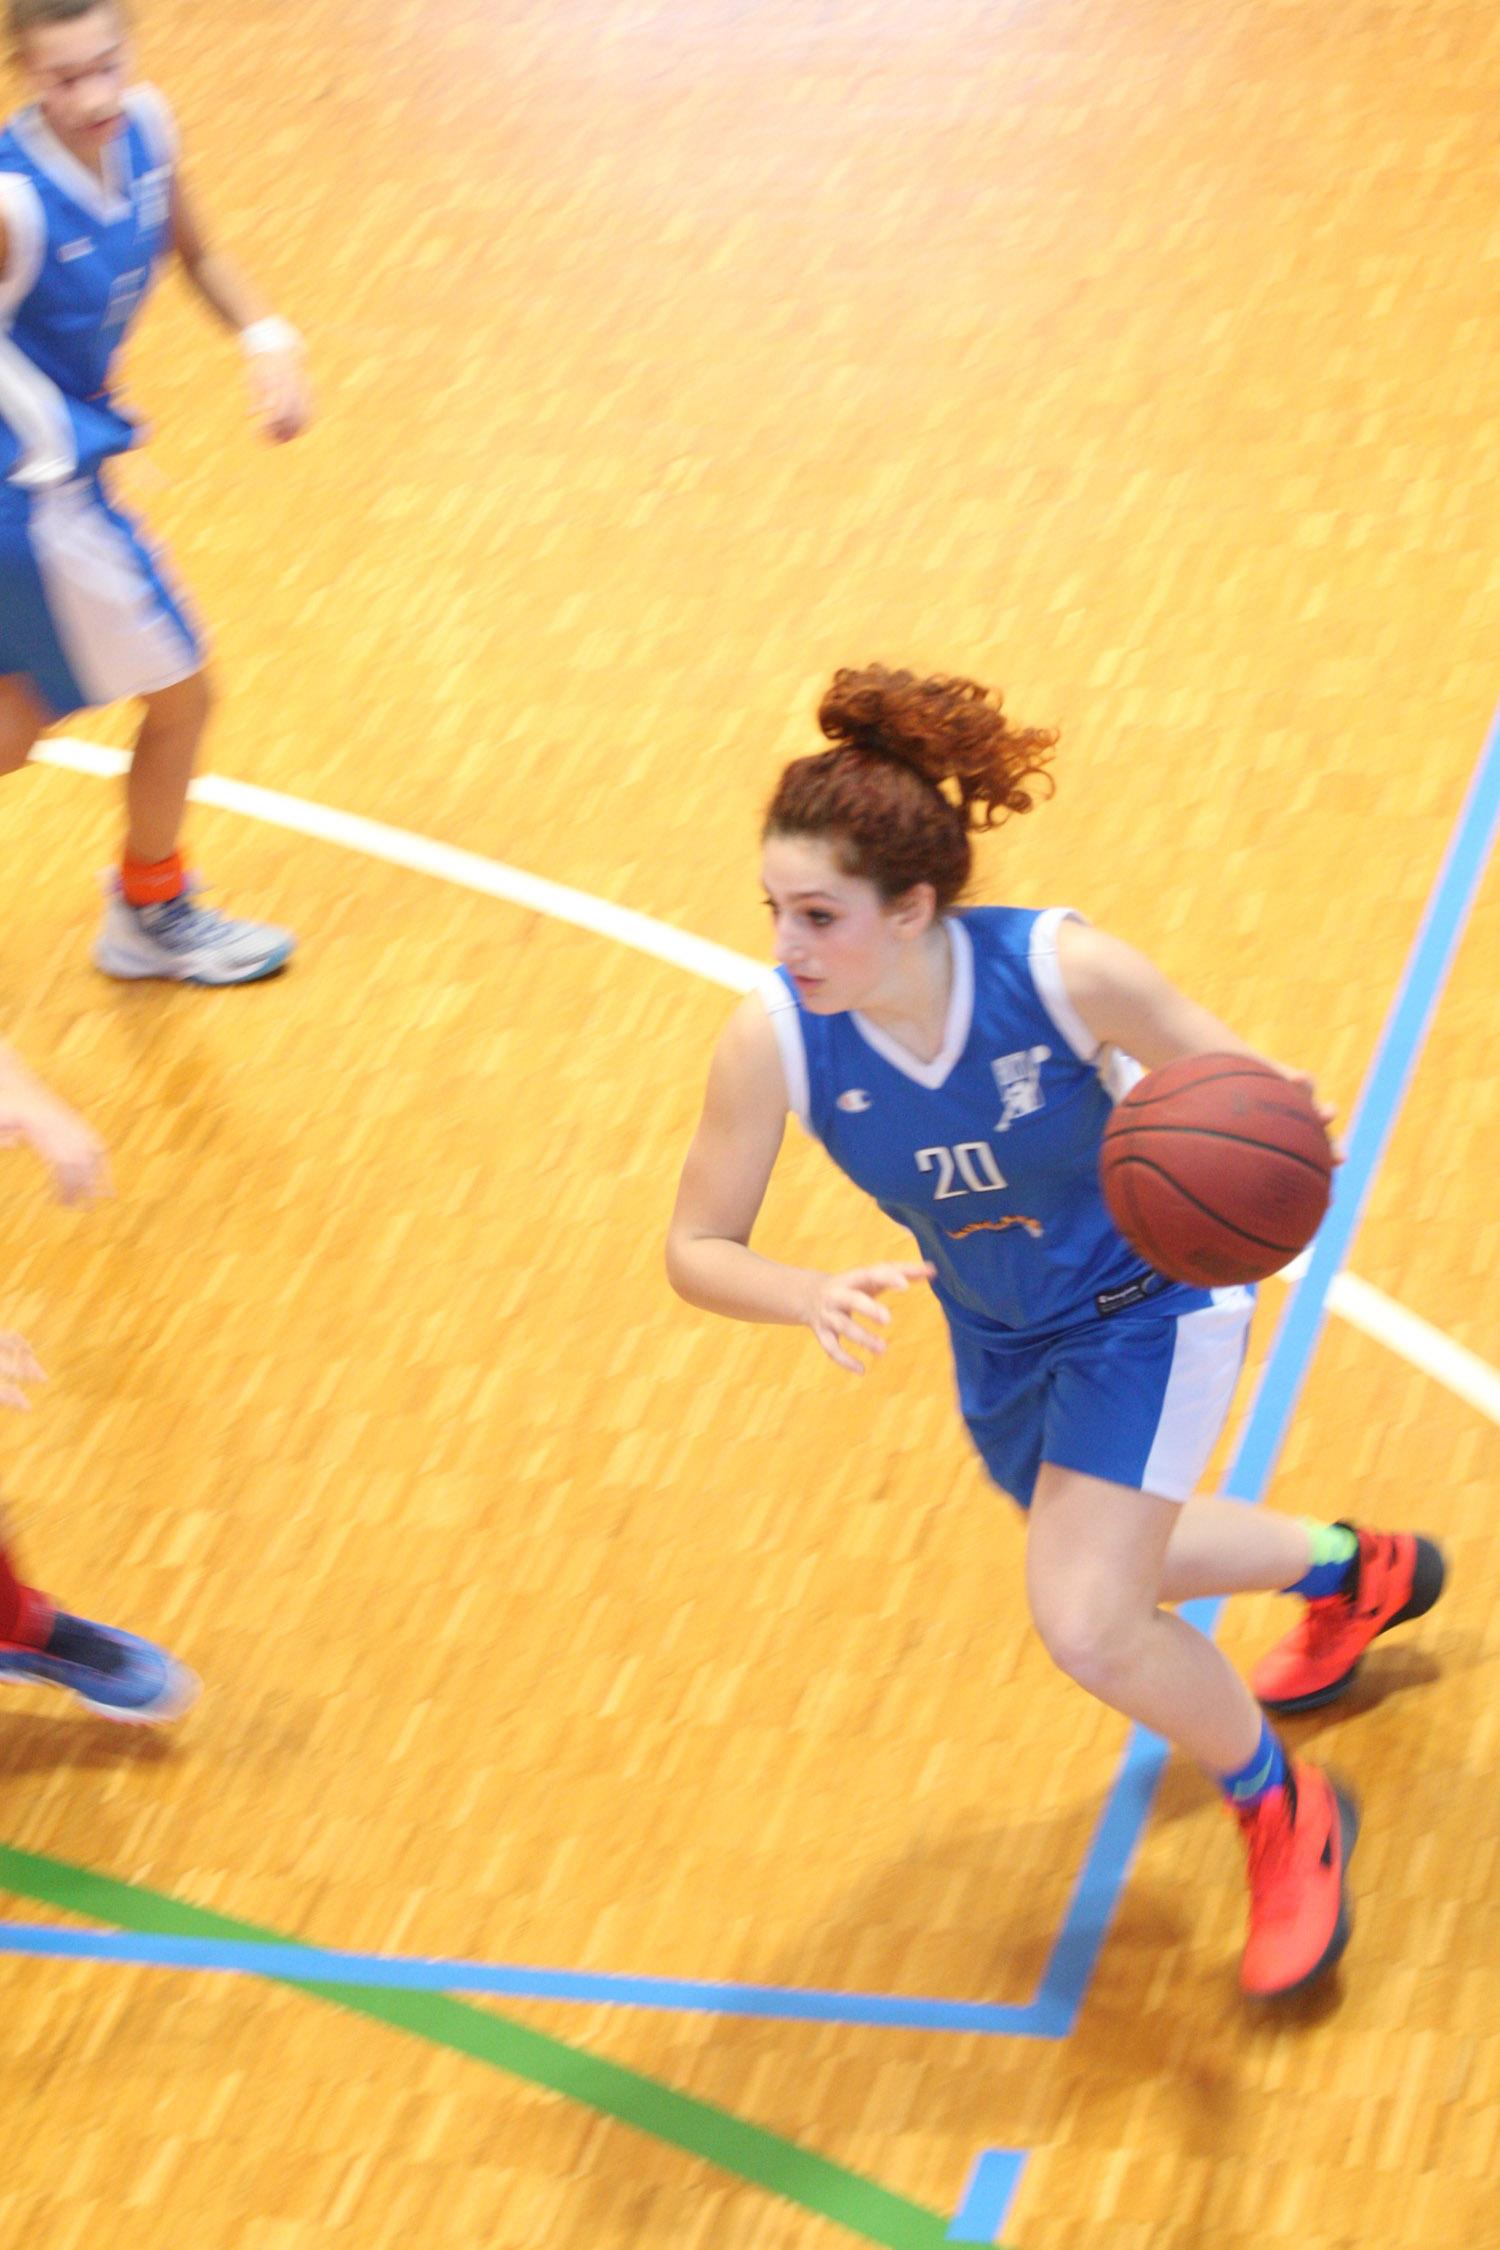 U16E - Costa Masnaga vs Baskettiamo Vittuone 2001 00028.jpg